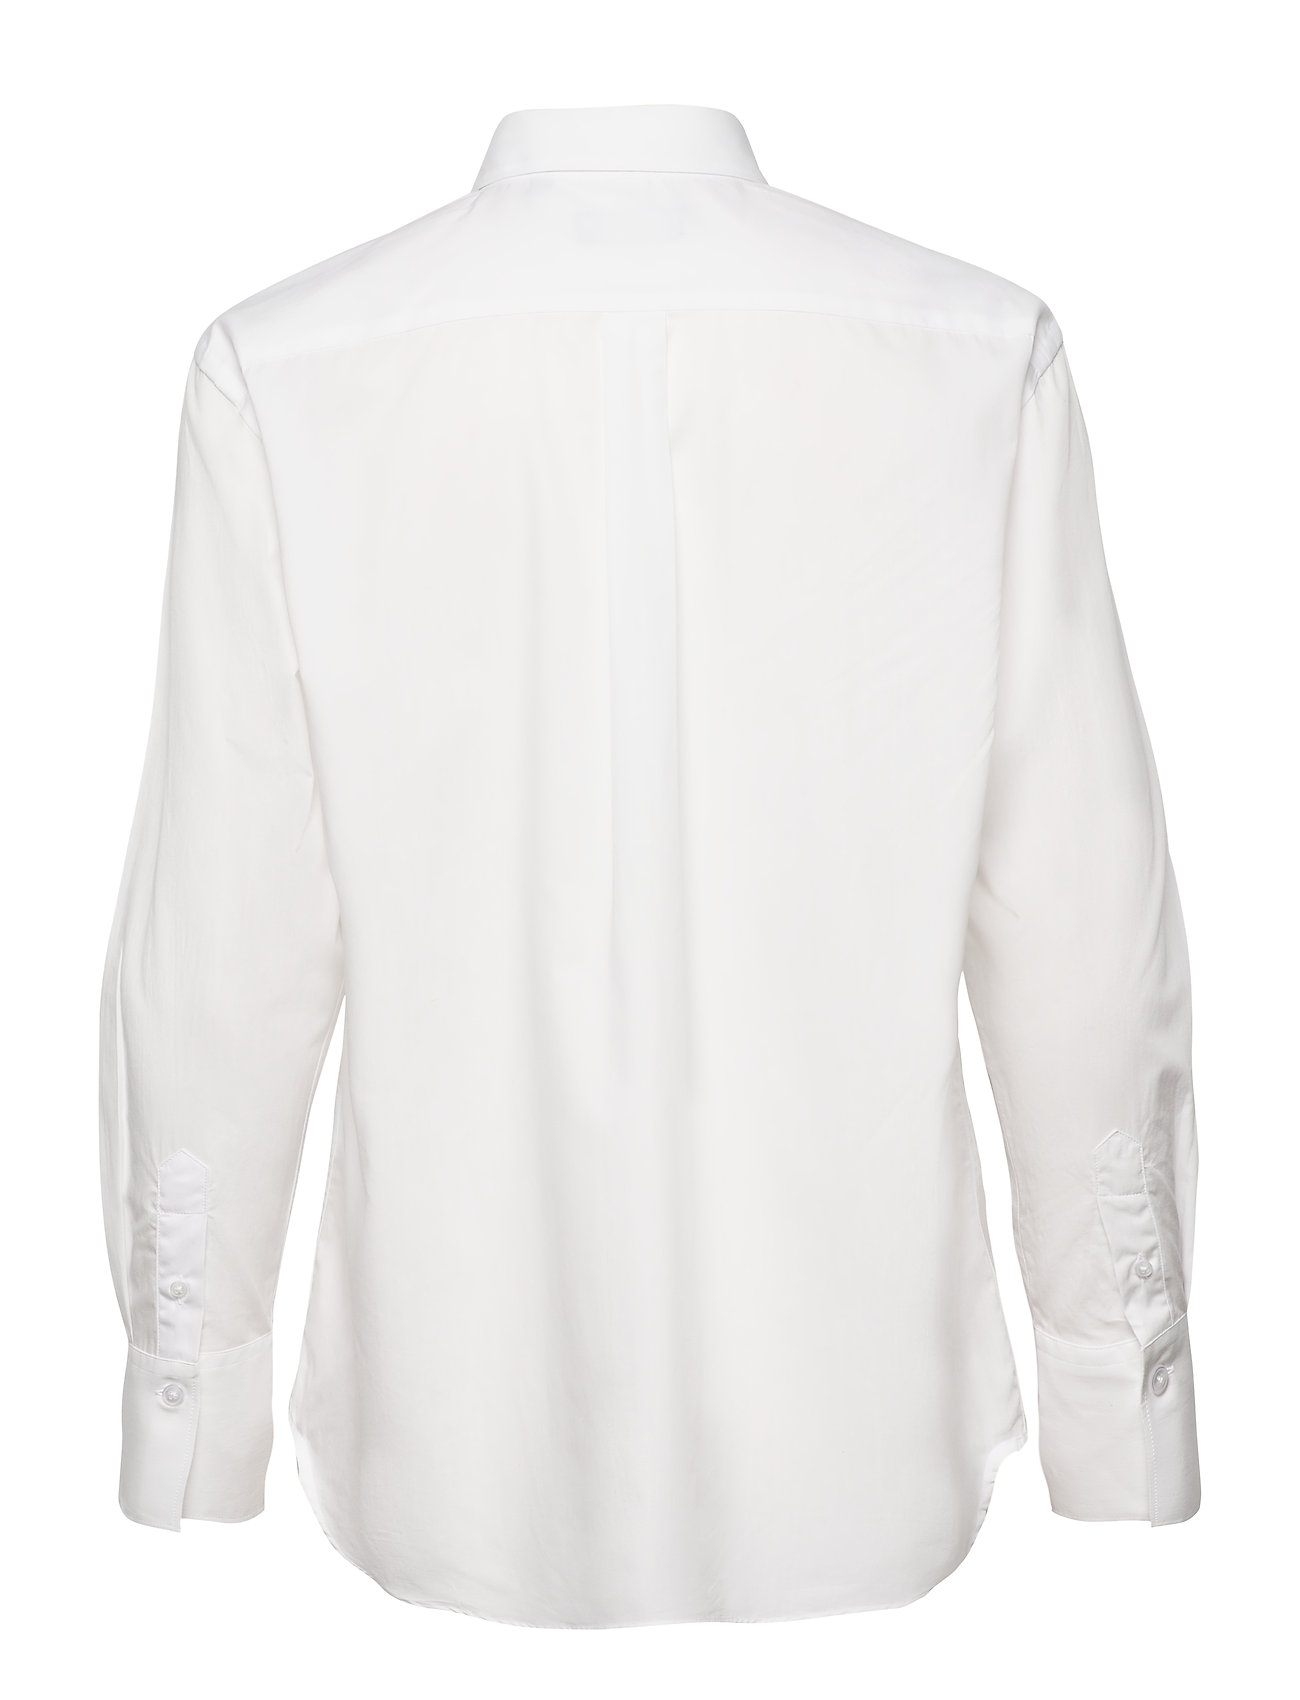 SAND - 8704 - Nube - overhemden met lange mouwen - optical white - 1